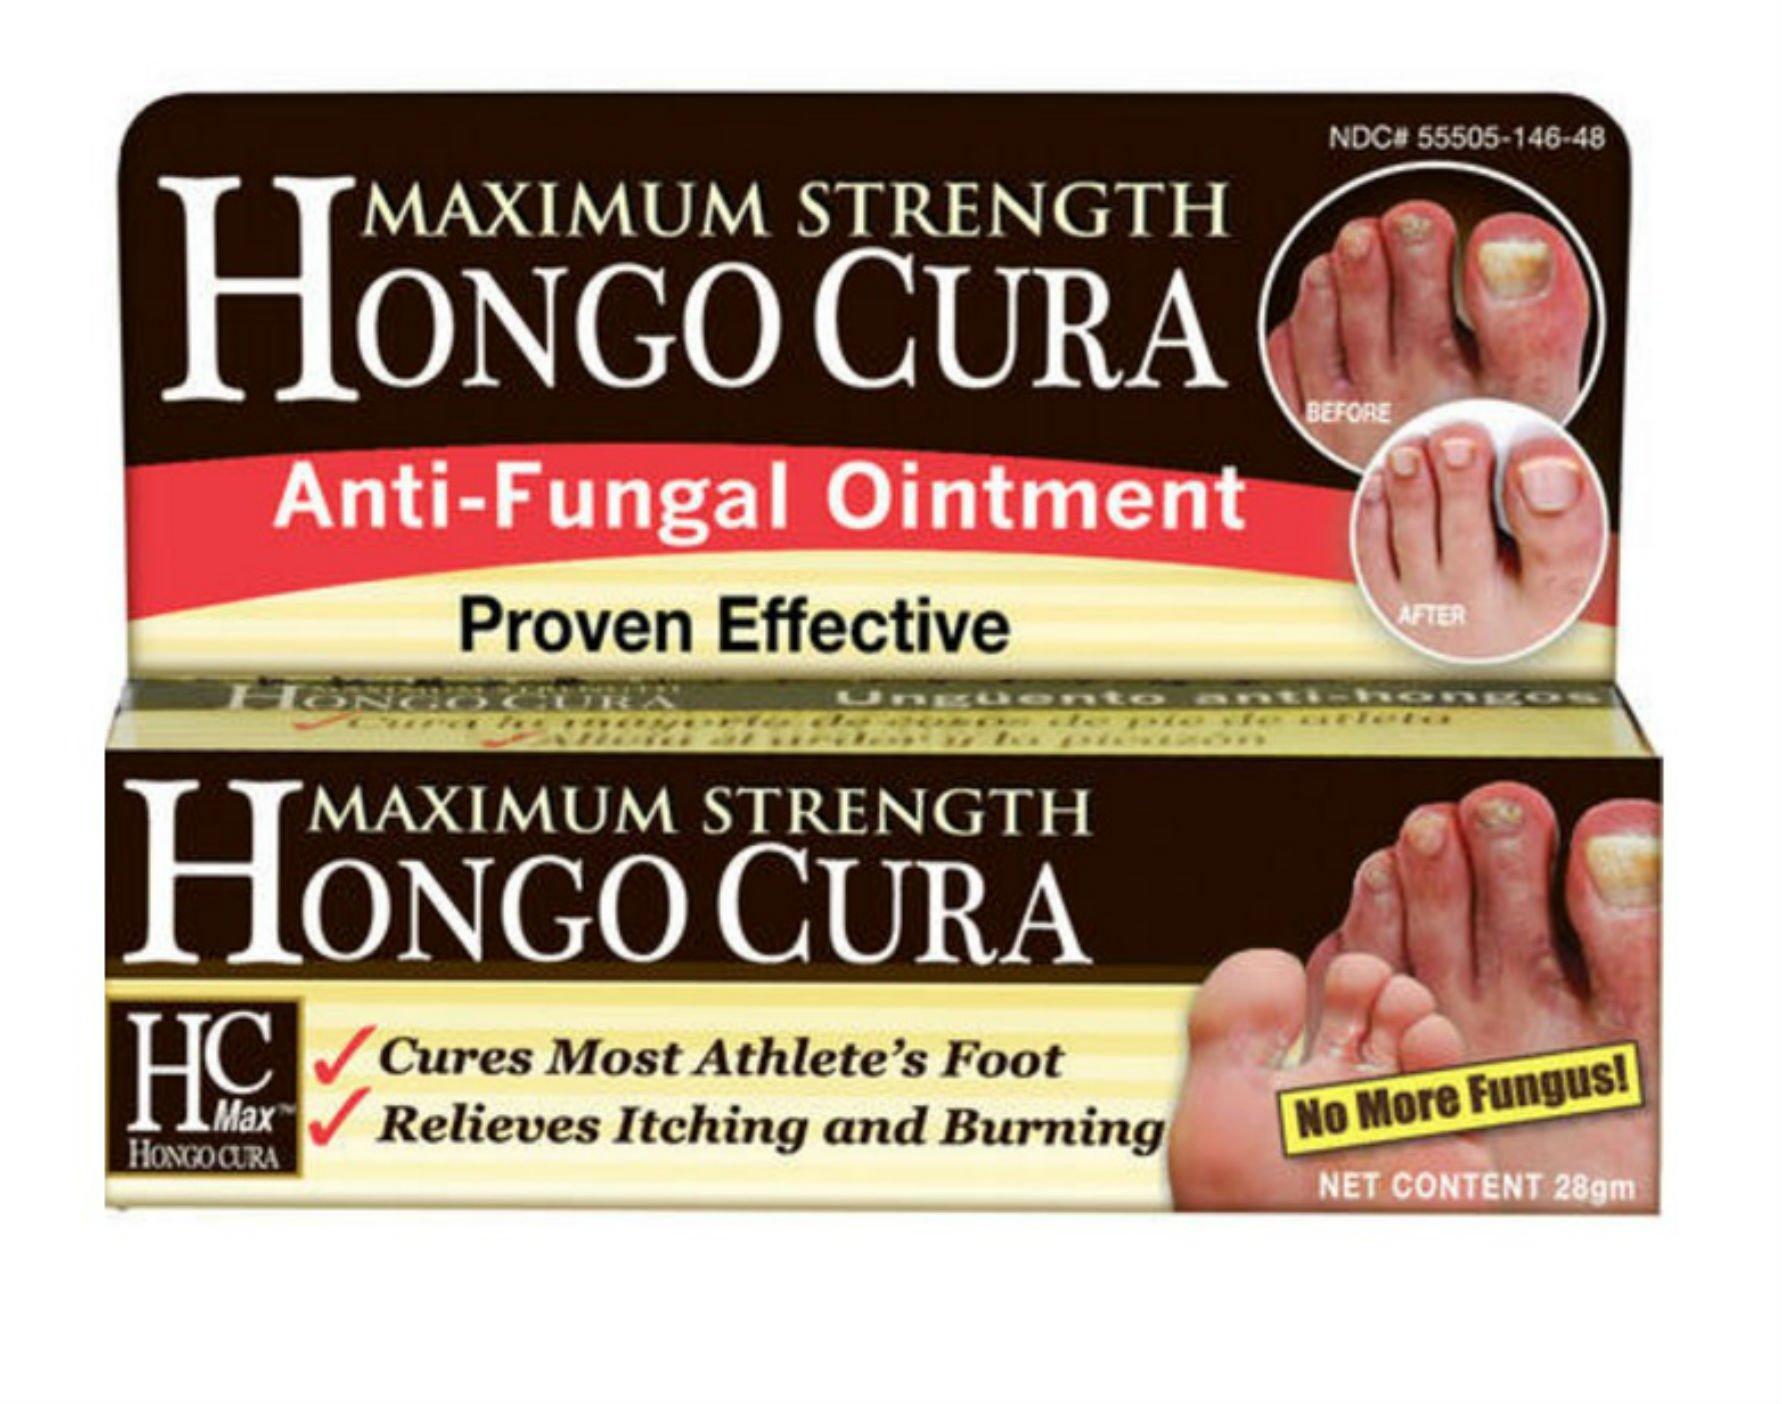 Maximum Strength Hongo Cura Anti-Fungal Ointment, 28gm